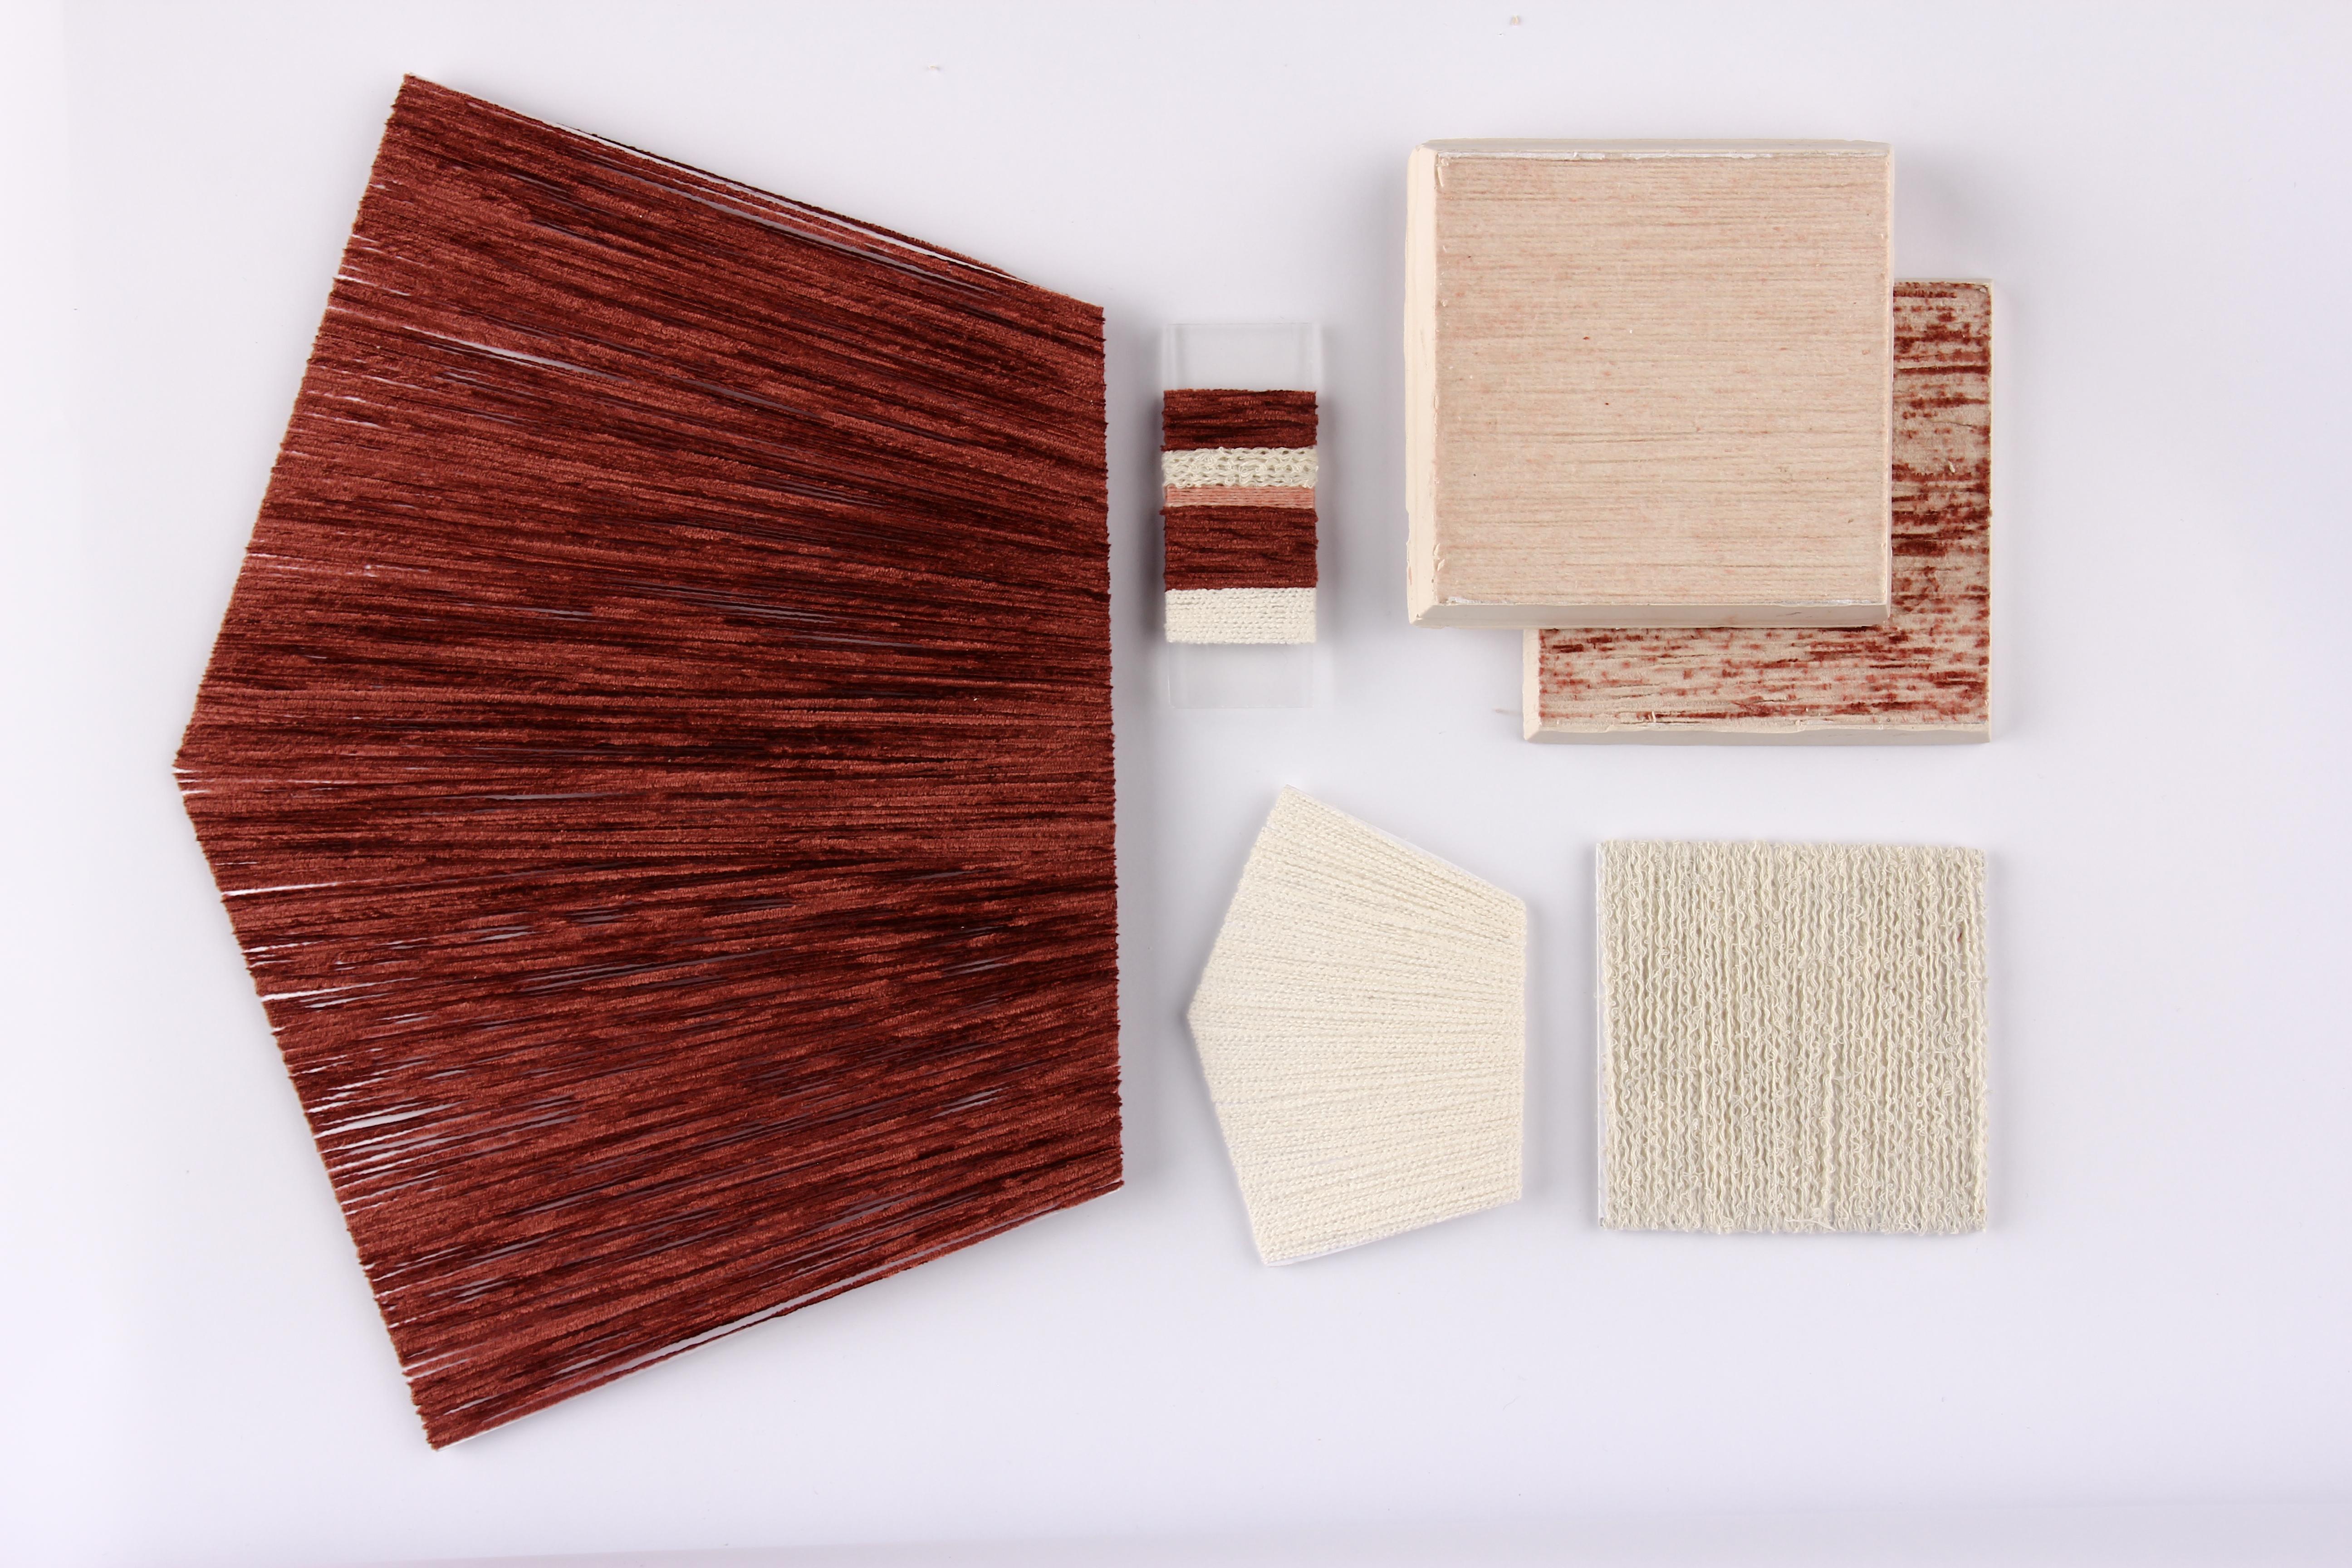 Erin Parfitt Surfaceology